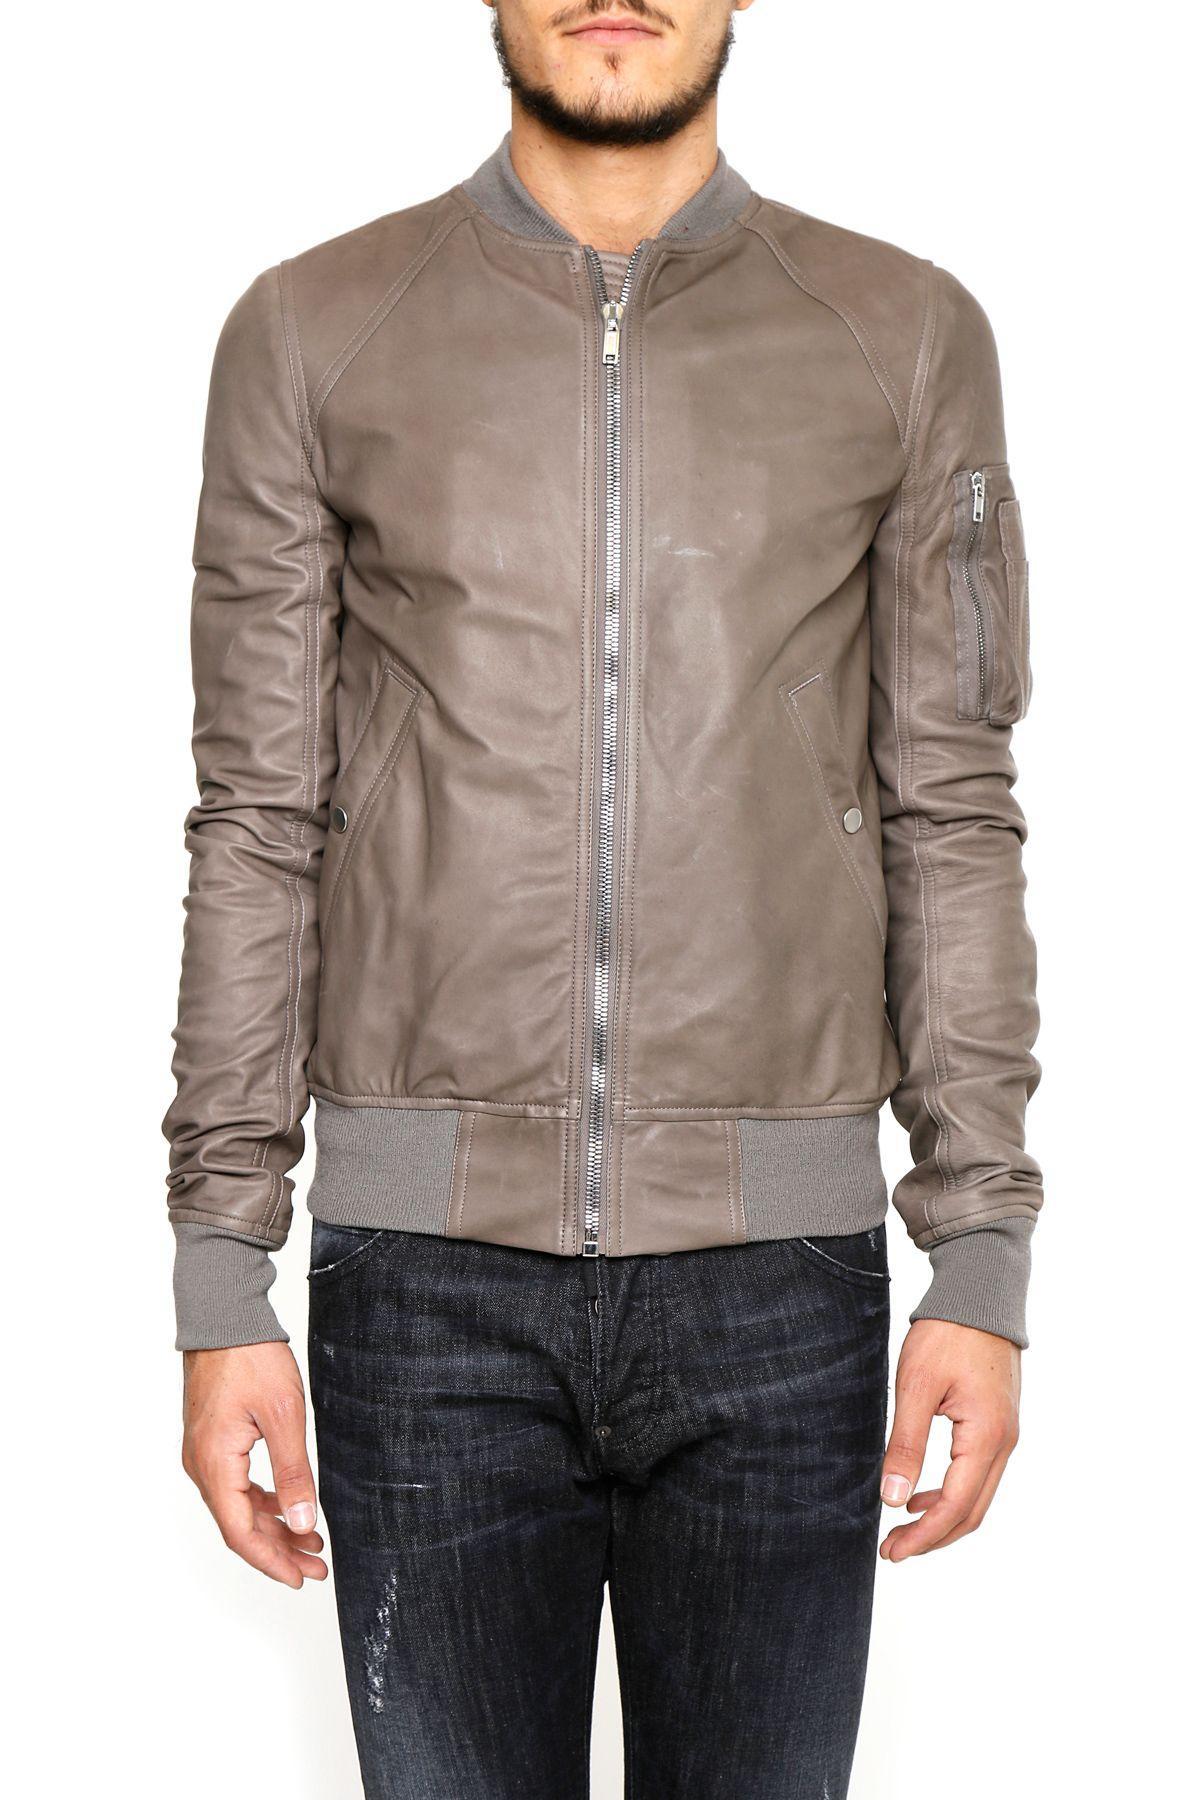 Rick Owens Lambskin Jacket In Dark Dust grigio